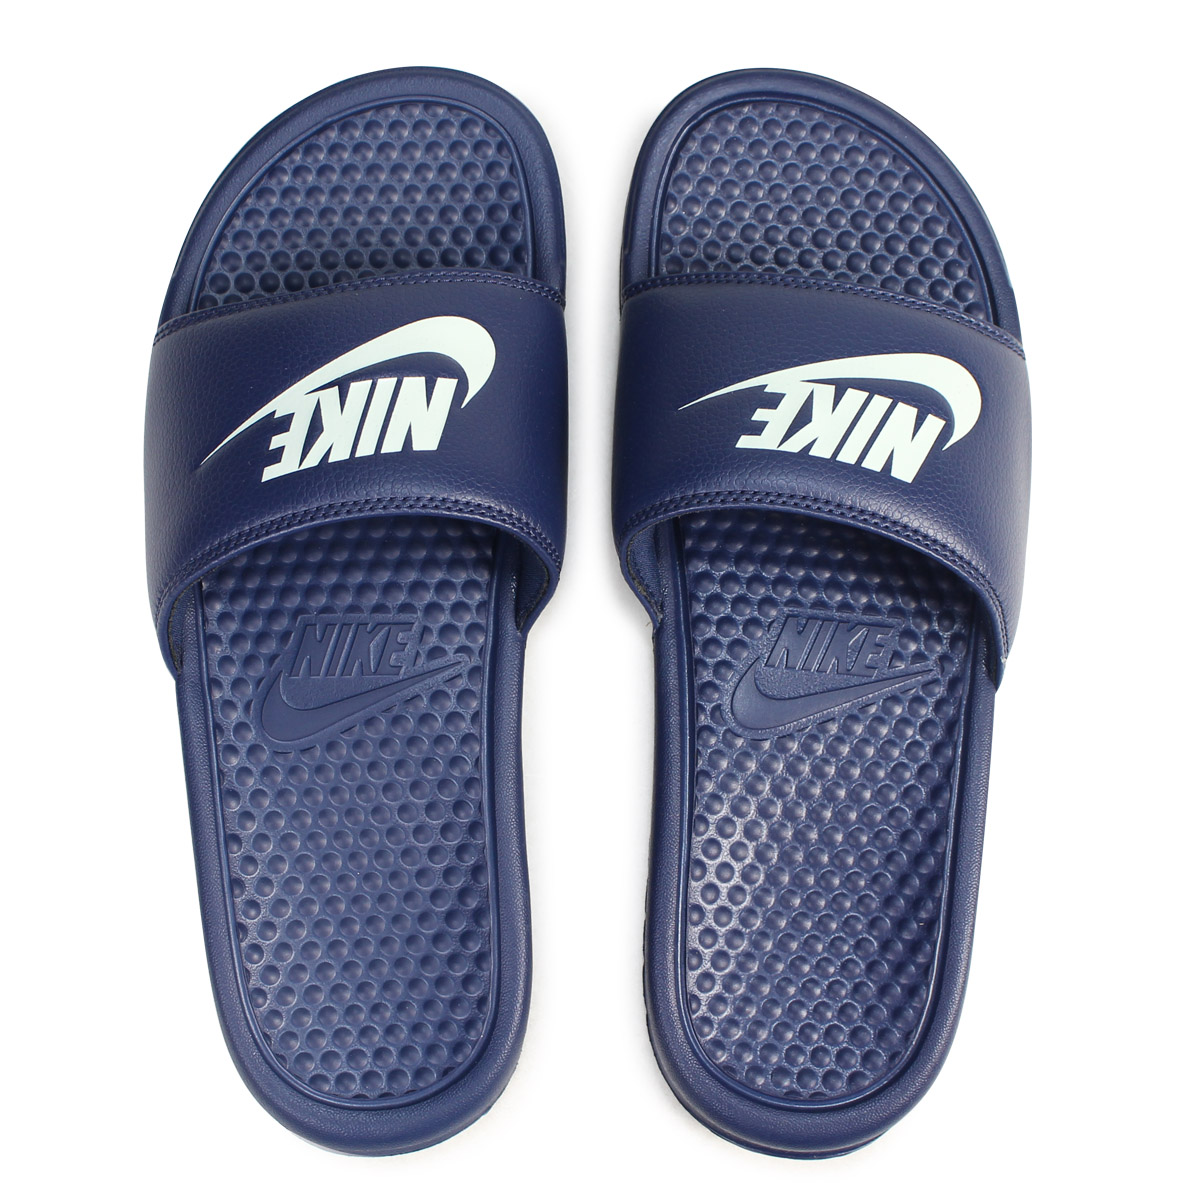 d1c37ef6a9c6 Nike NIKE sandals べ ナッシシャワーサンダルスポーツ BENASSI JUST DO IT 343